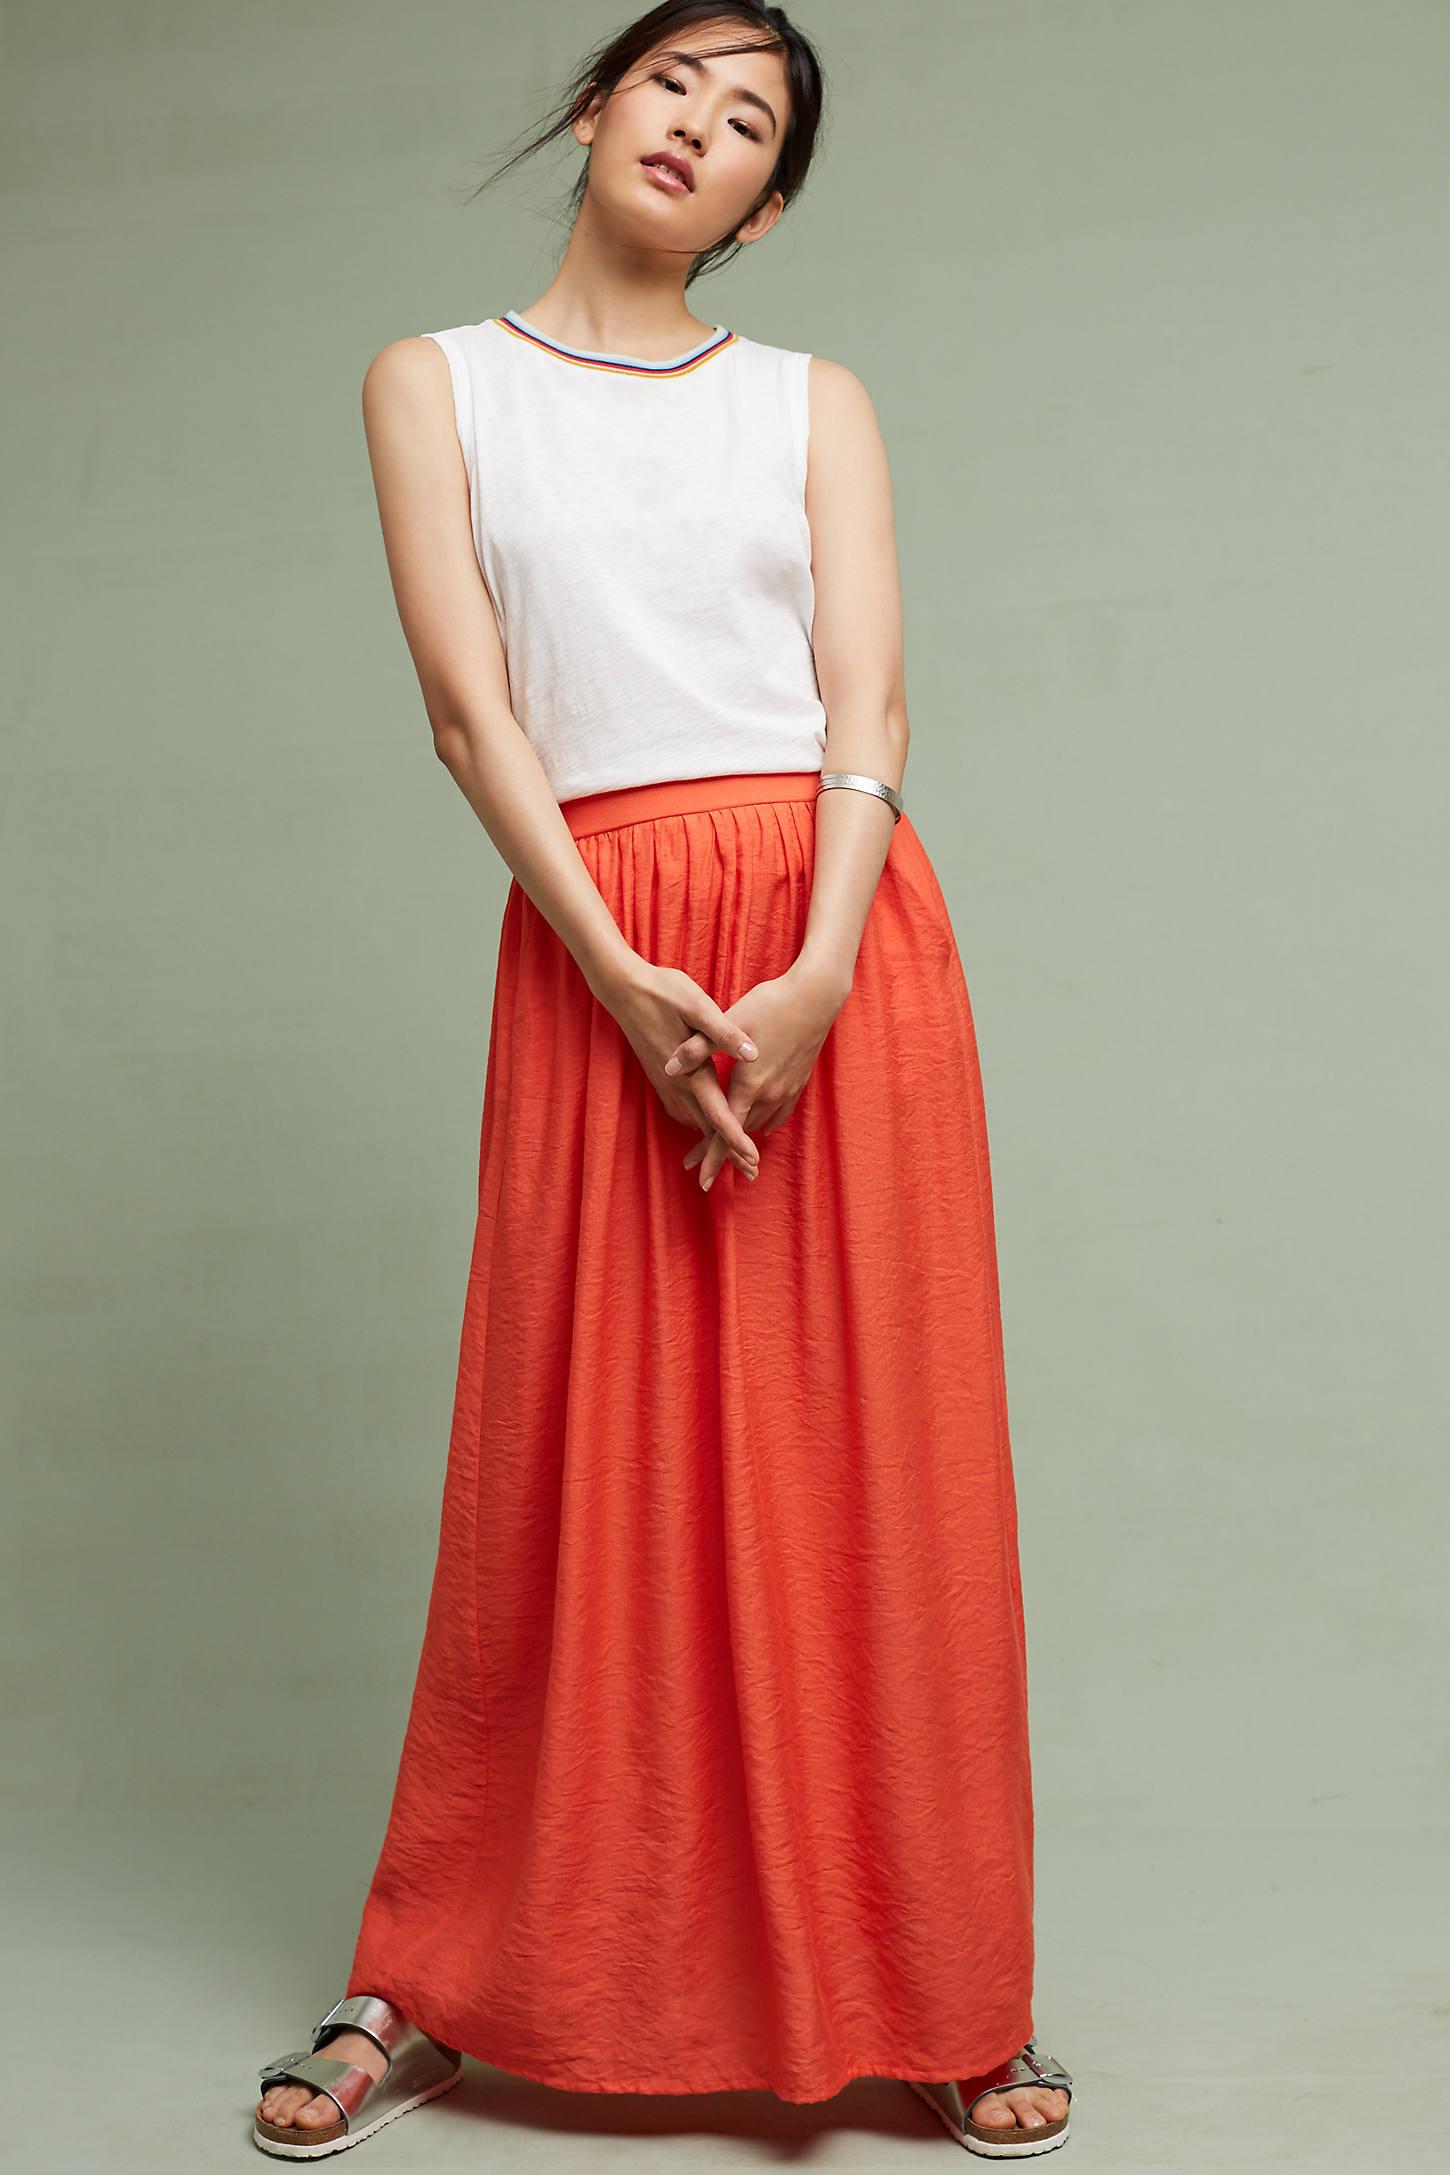 Norwich Skirt